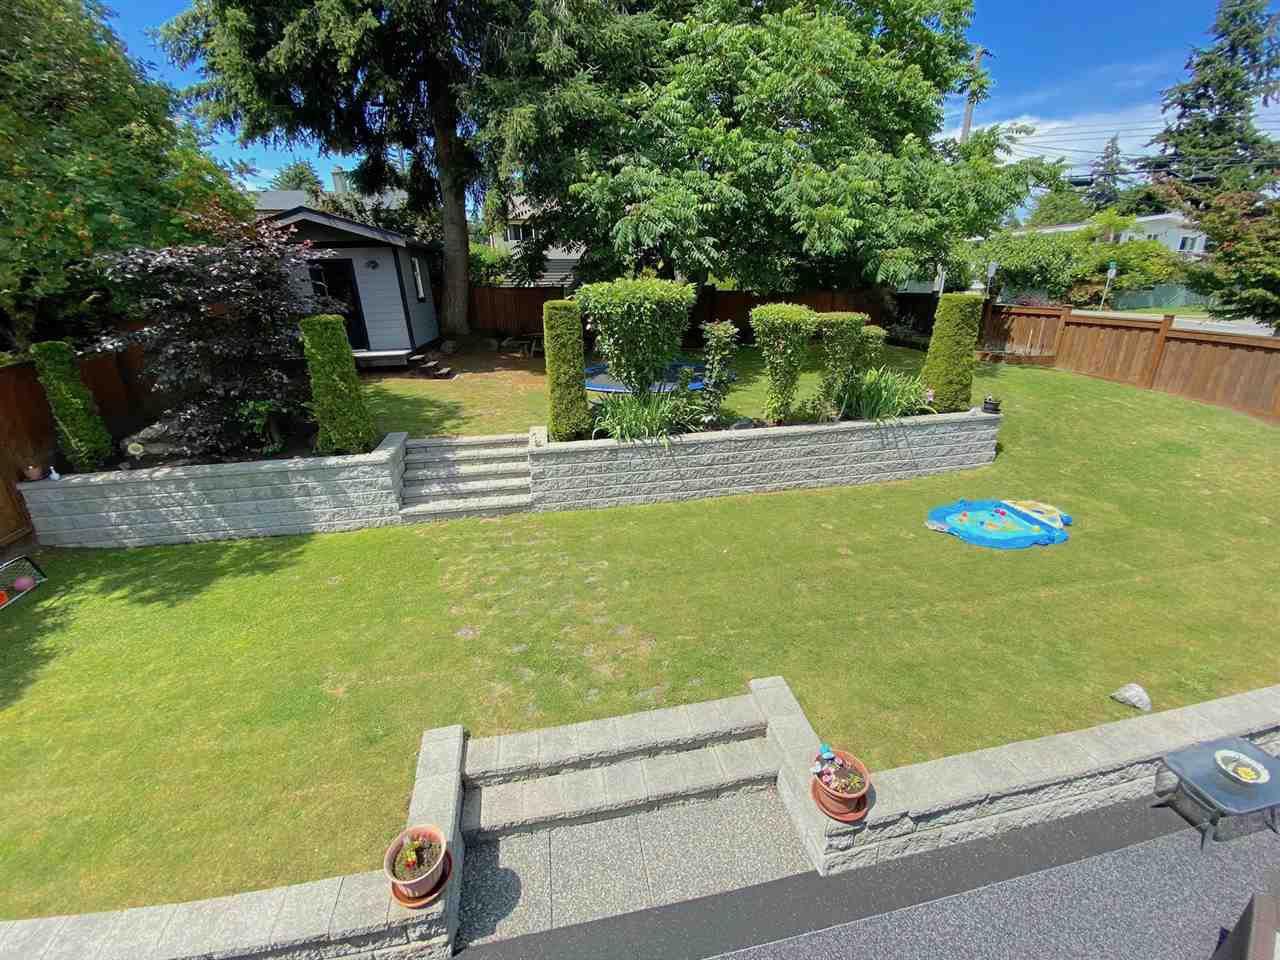 Photo 20: Photos: 555 55A STREET in Delta: Pebble Hill House for sale (Tsawwassen)  : MLS®# R2481635